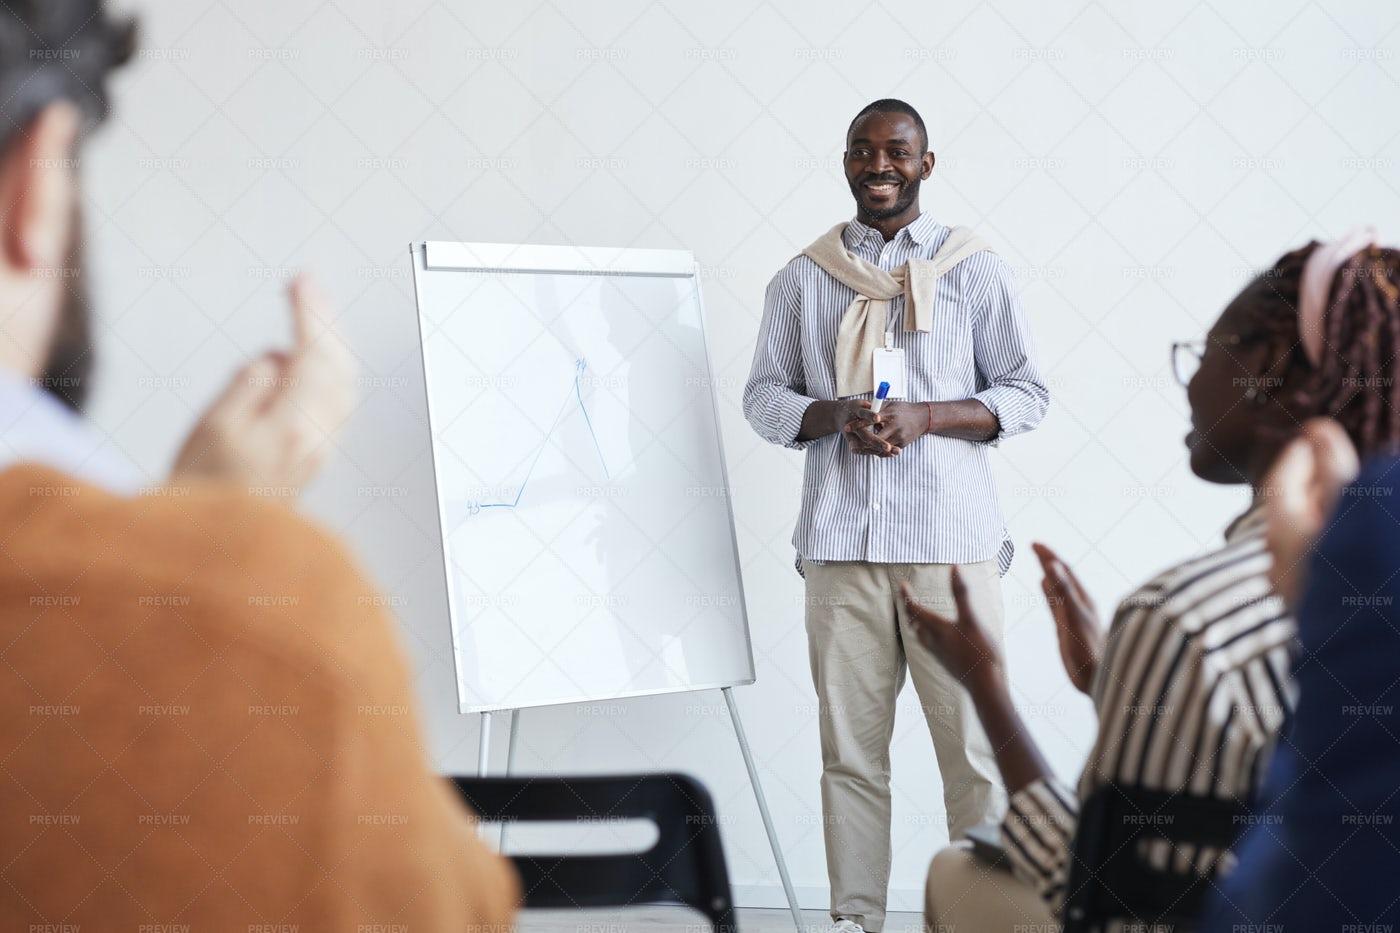 Business Coach Talking: Stock Photos